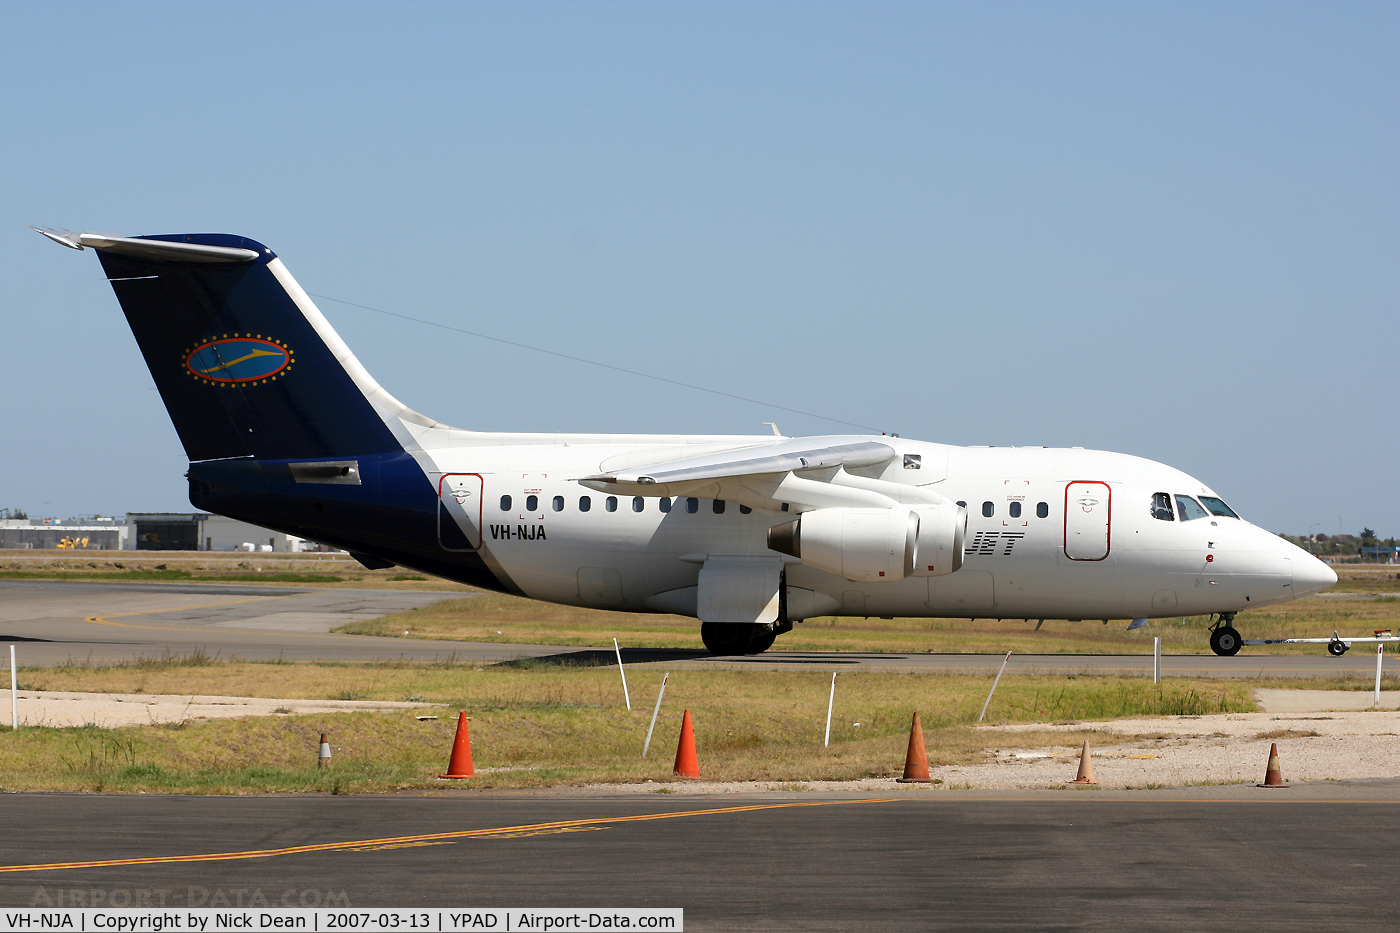 VH-NJA, 1982 British Aerospace BAe.146-100 C/N E1004, /